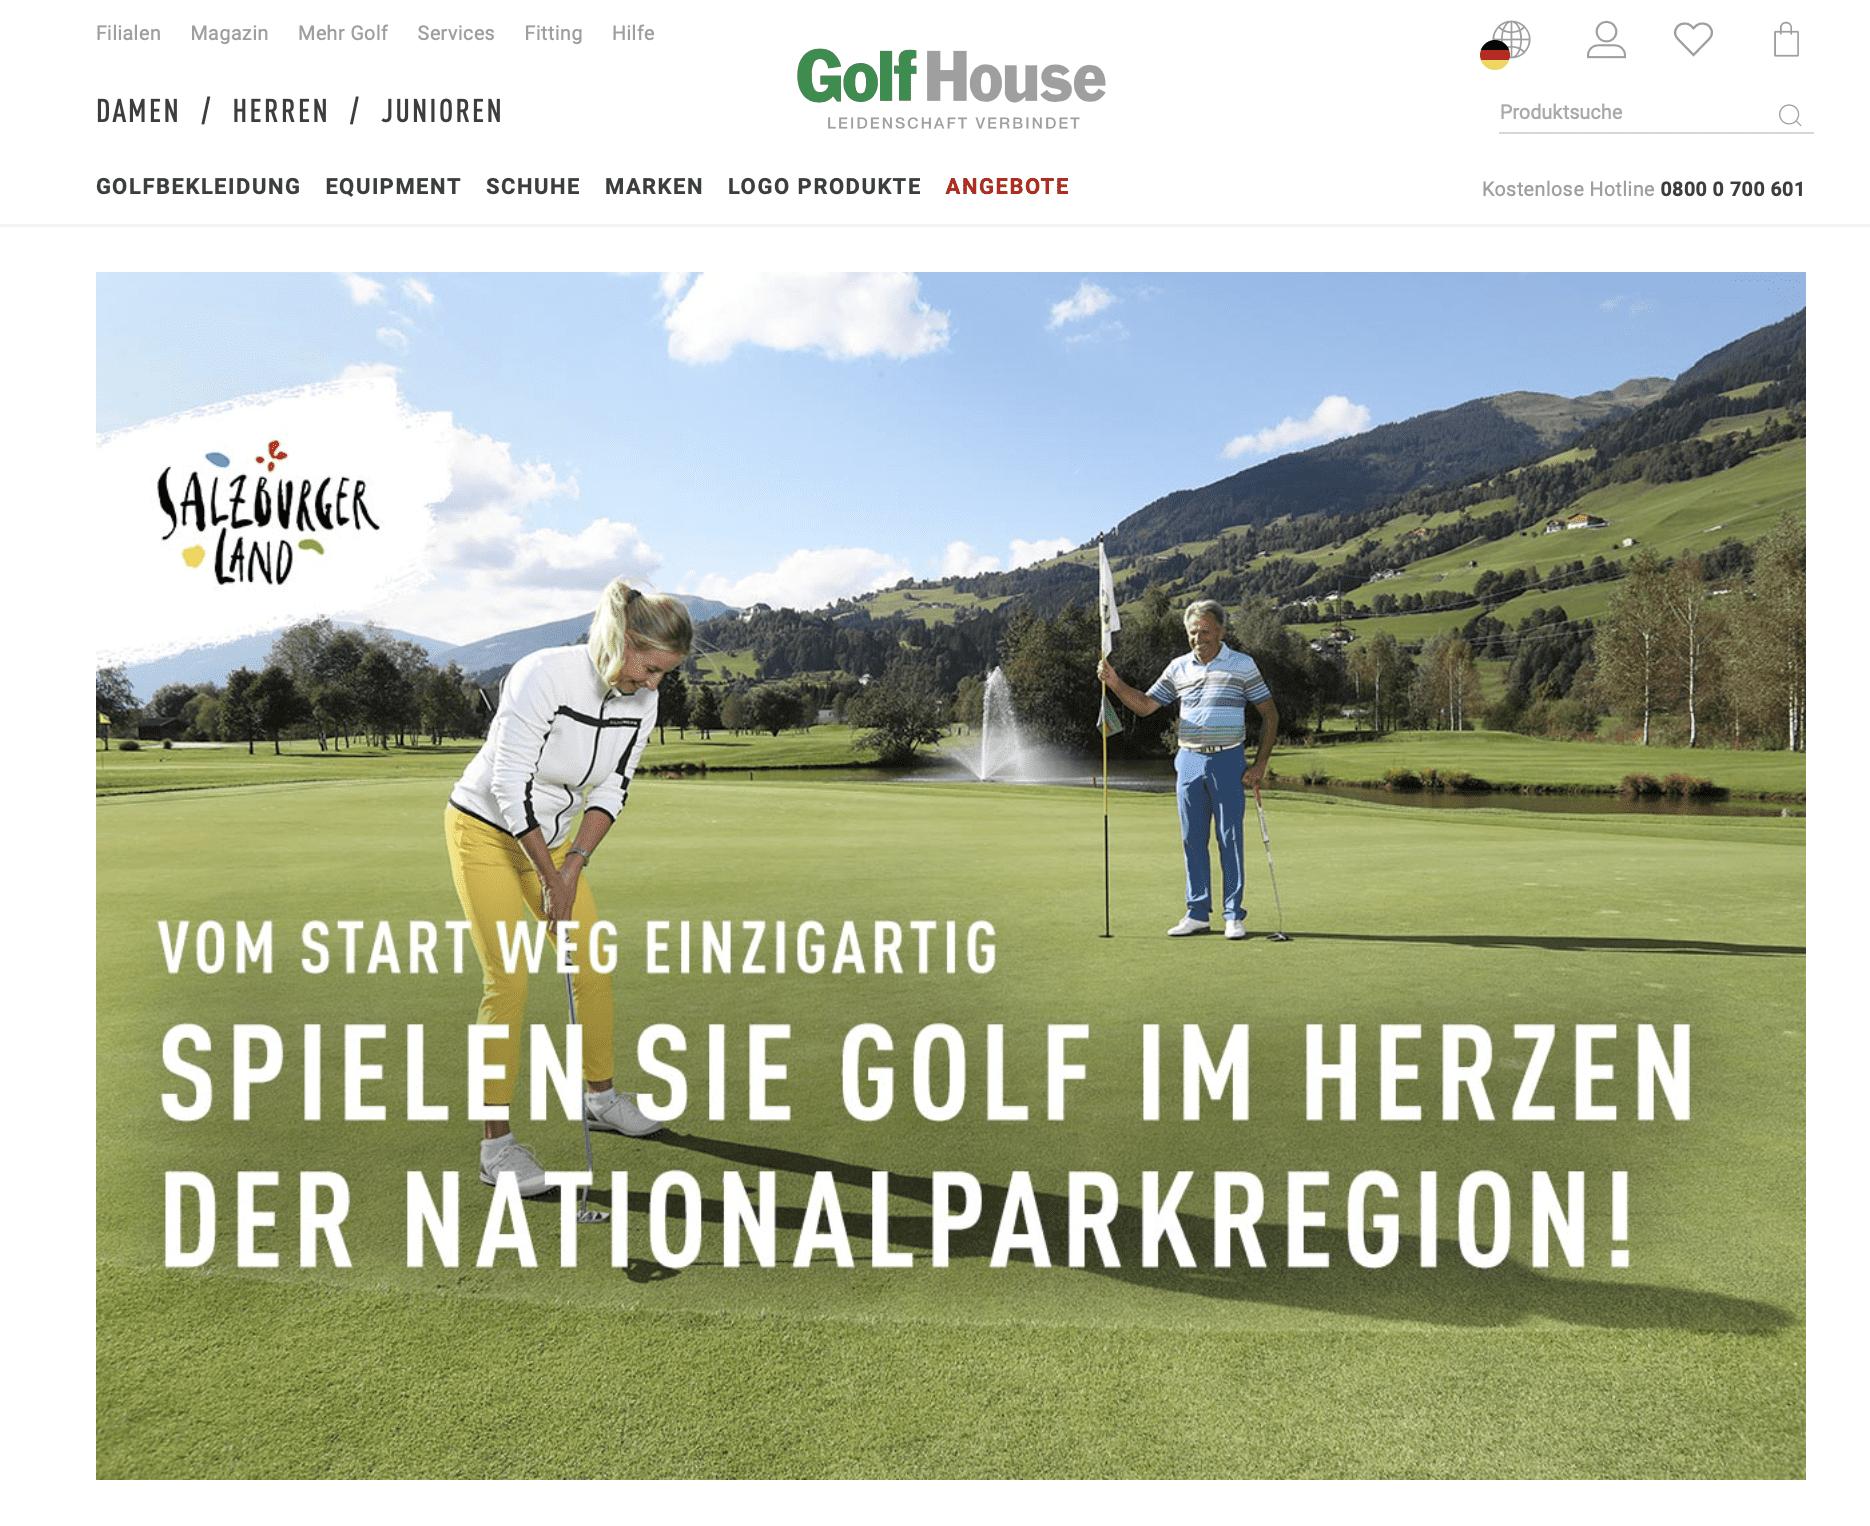 Golfhouse Gewinnspiel